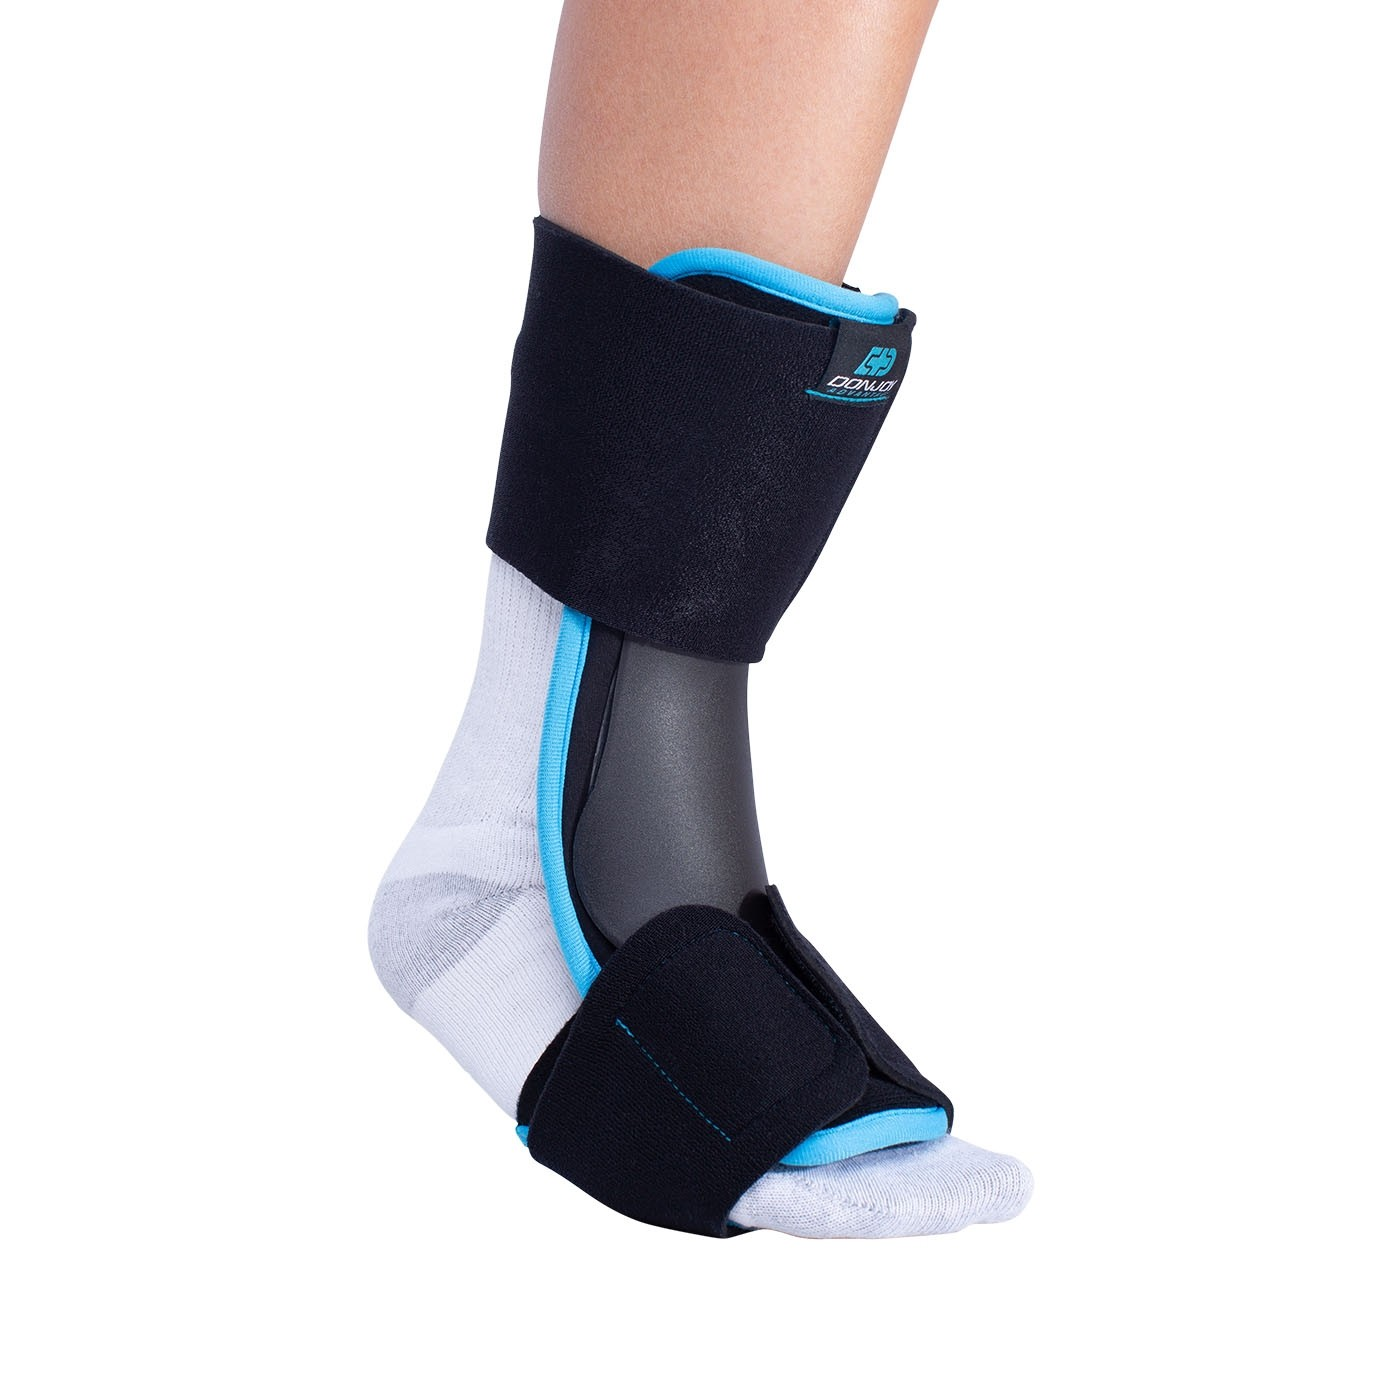 f2de706268 DonJoy Advantage Plantar Fasciitis Night Splint & Achilles Tendonitis Brace